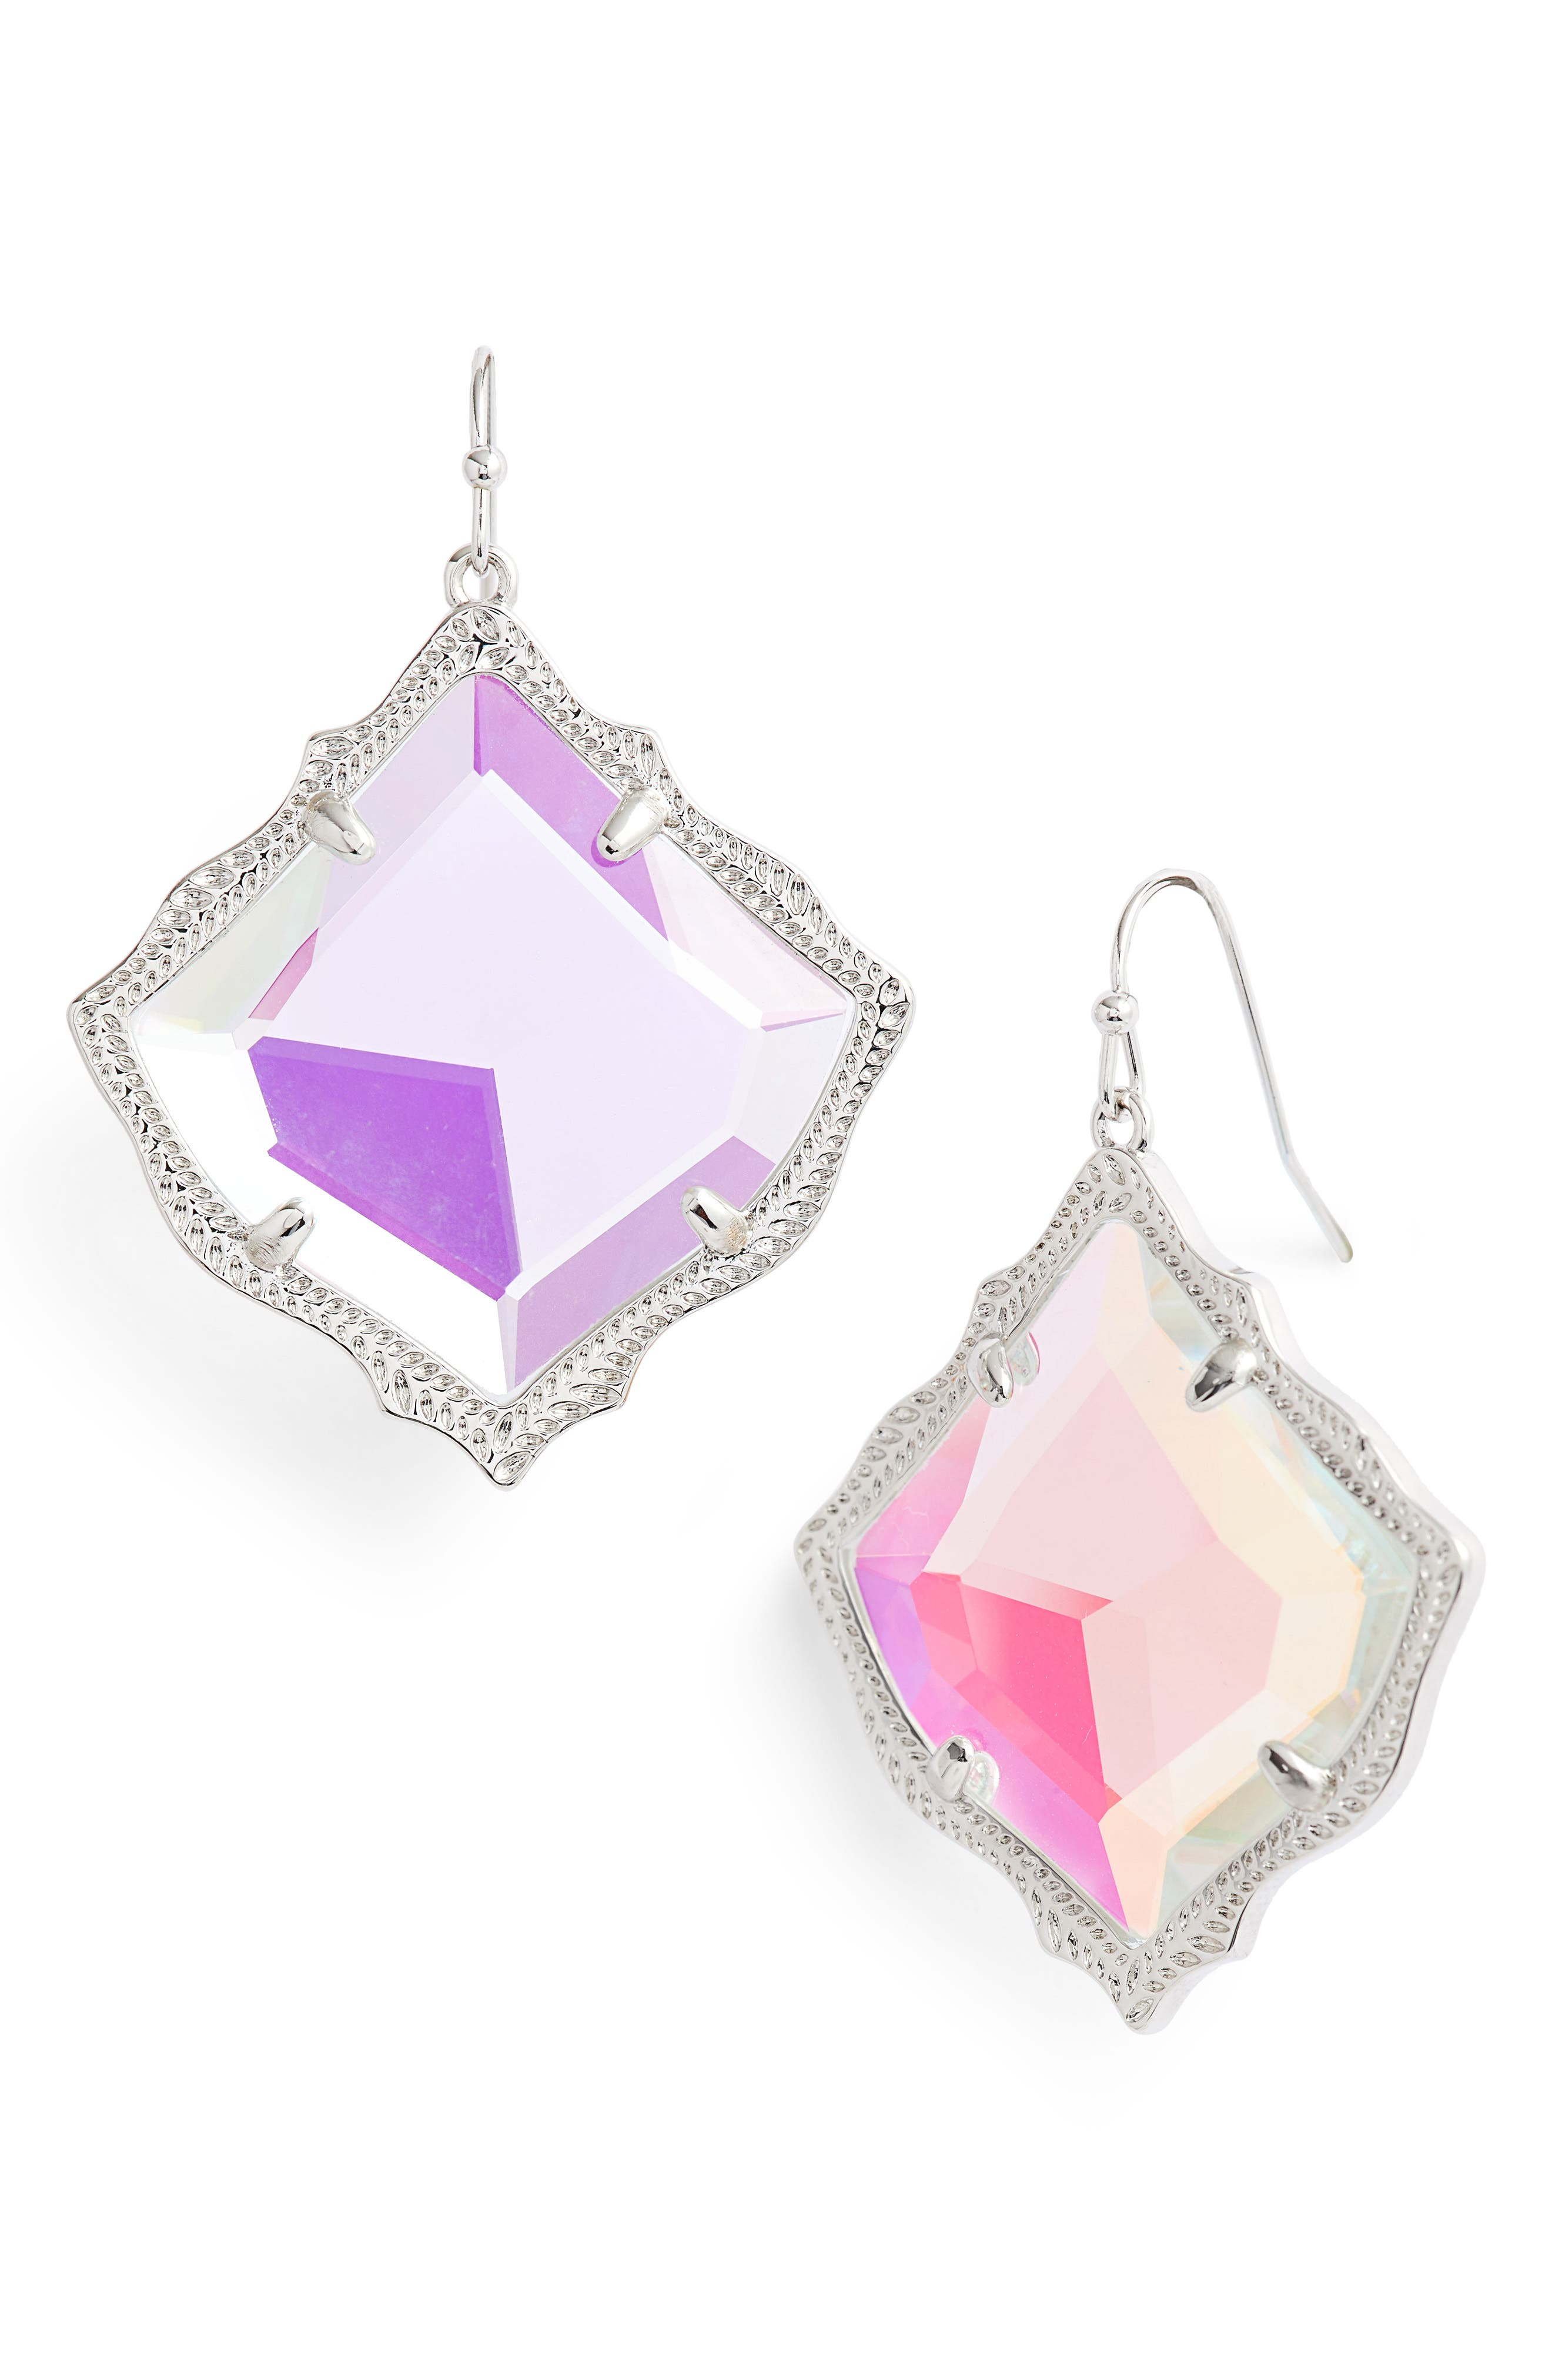 Kirsten Drop Earrings,                         Main,                         color, Dichroic Glass/ Silver